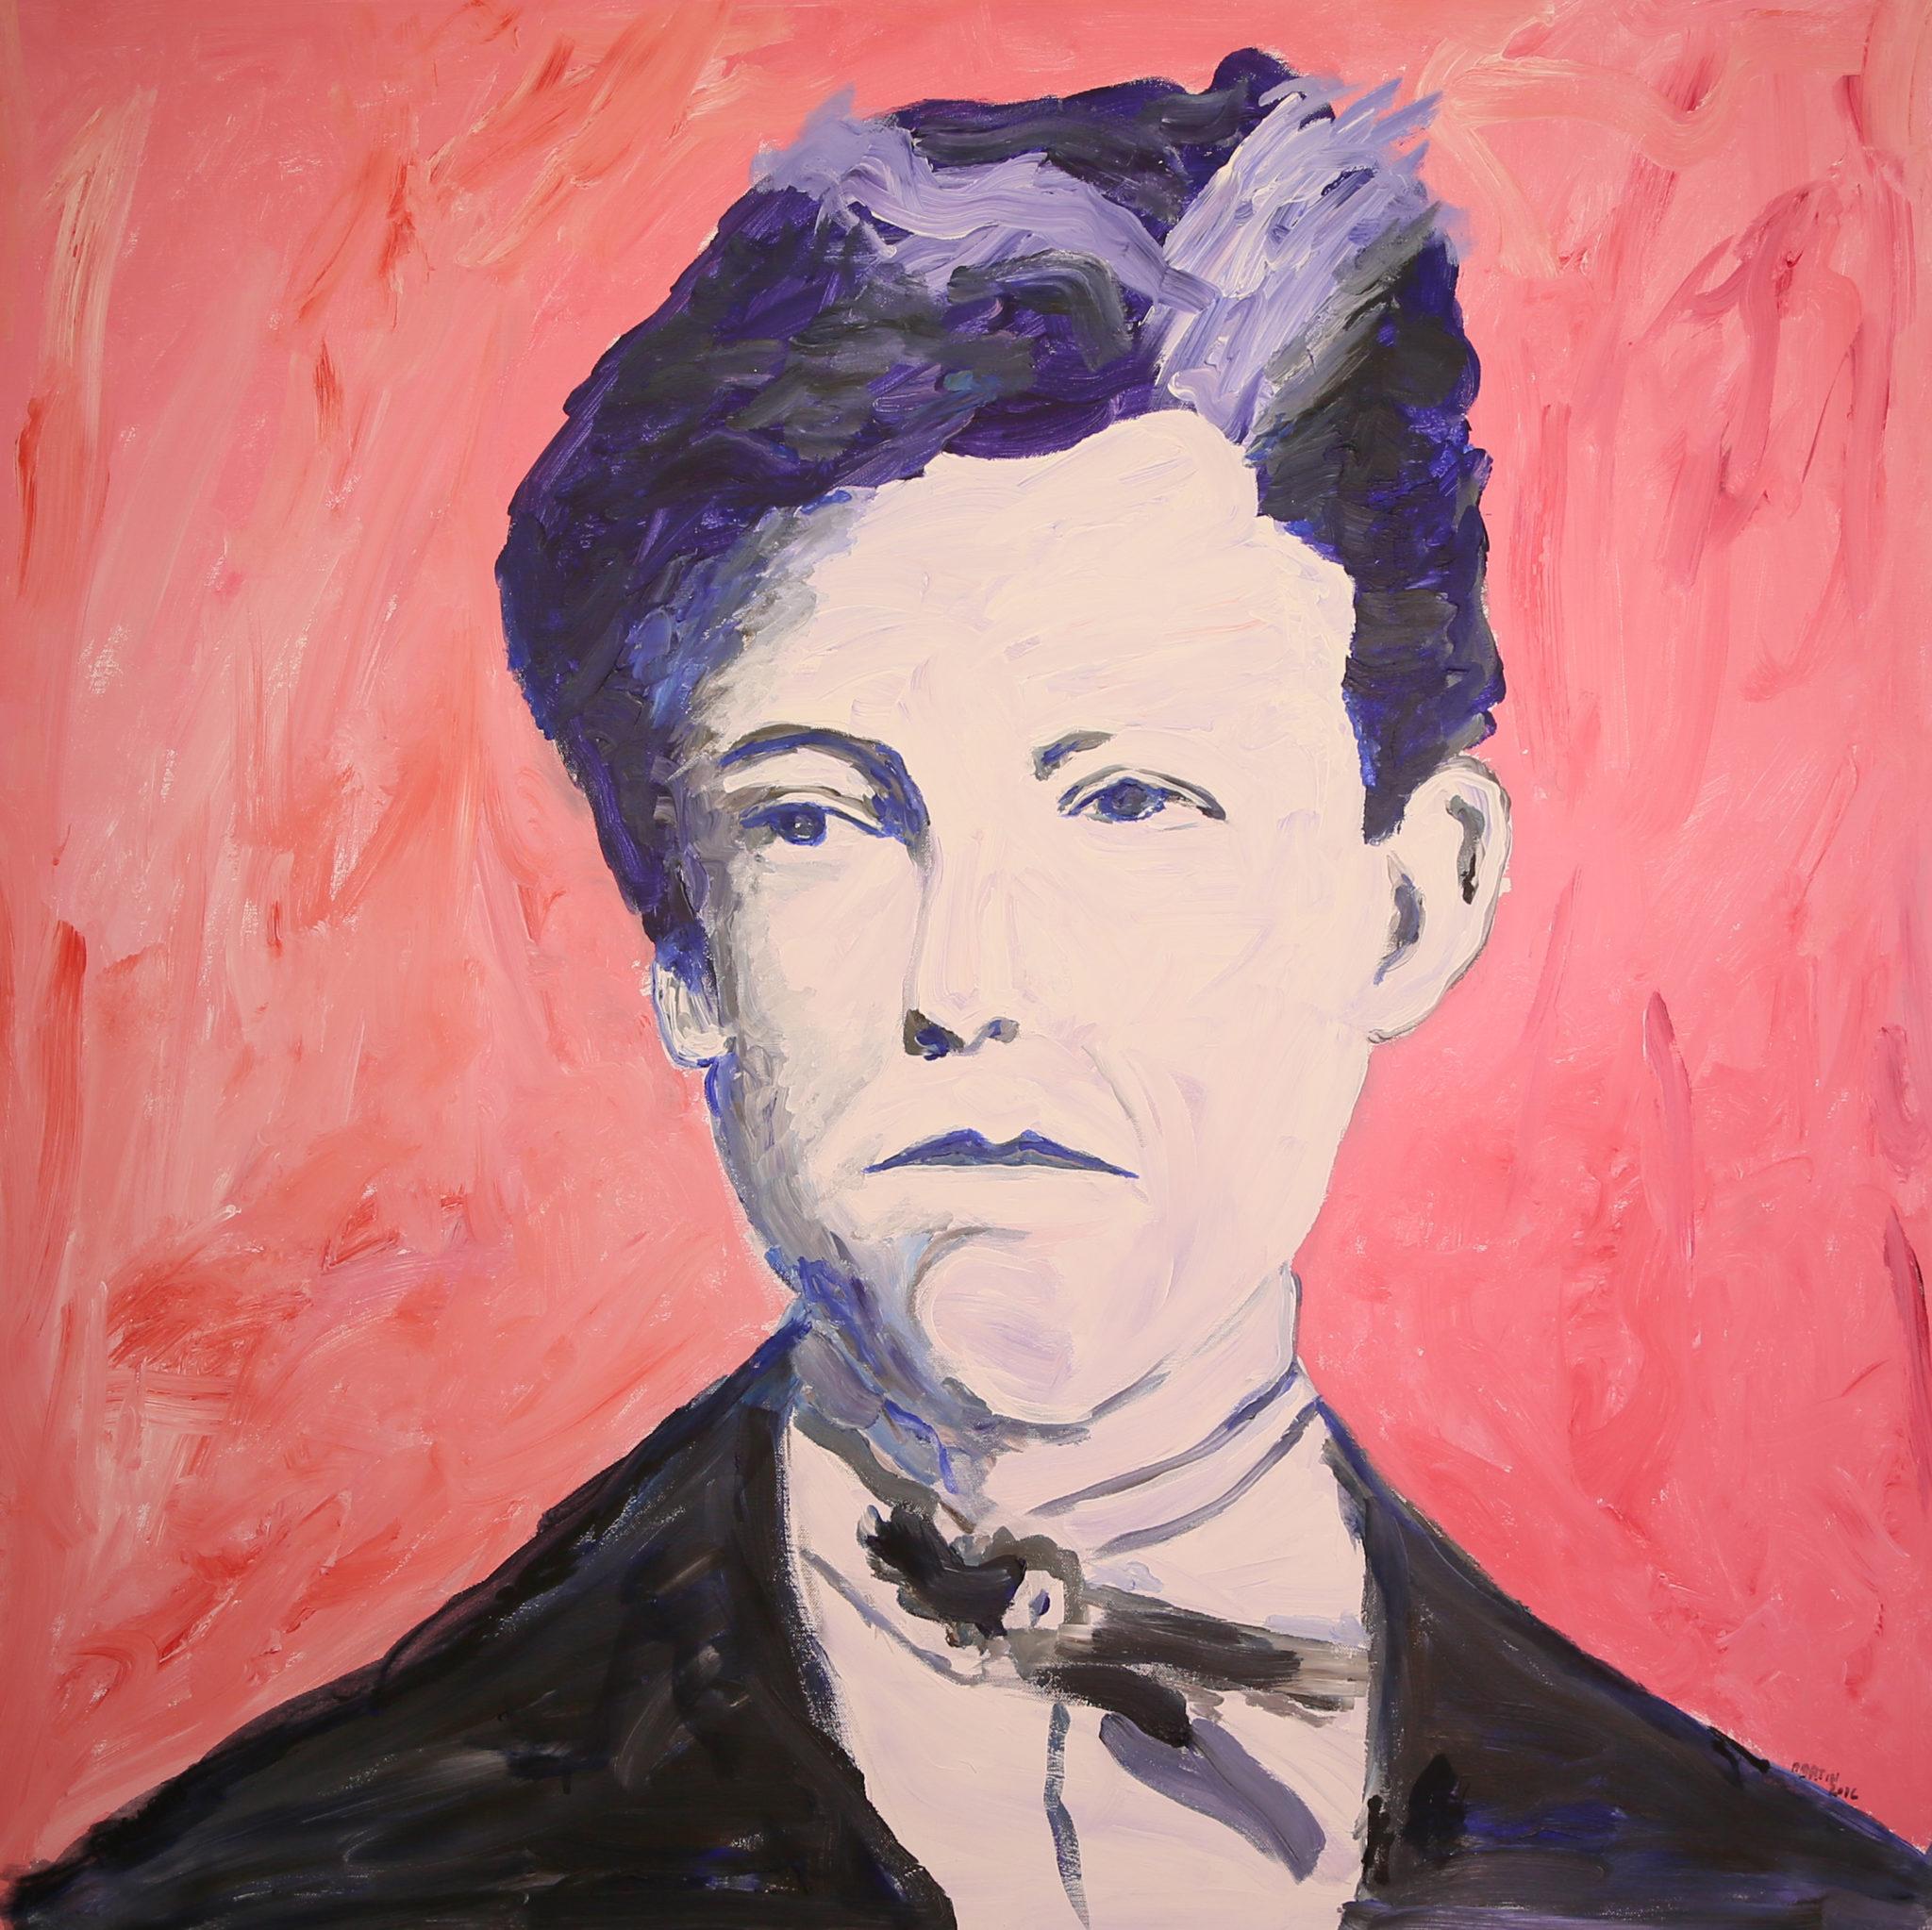 Rimbaud